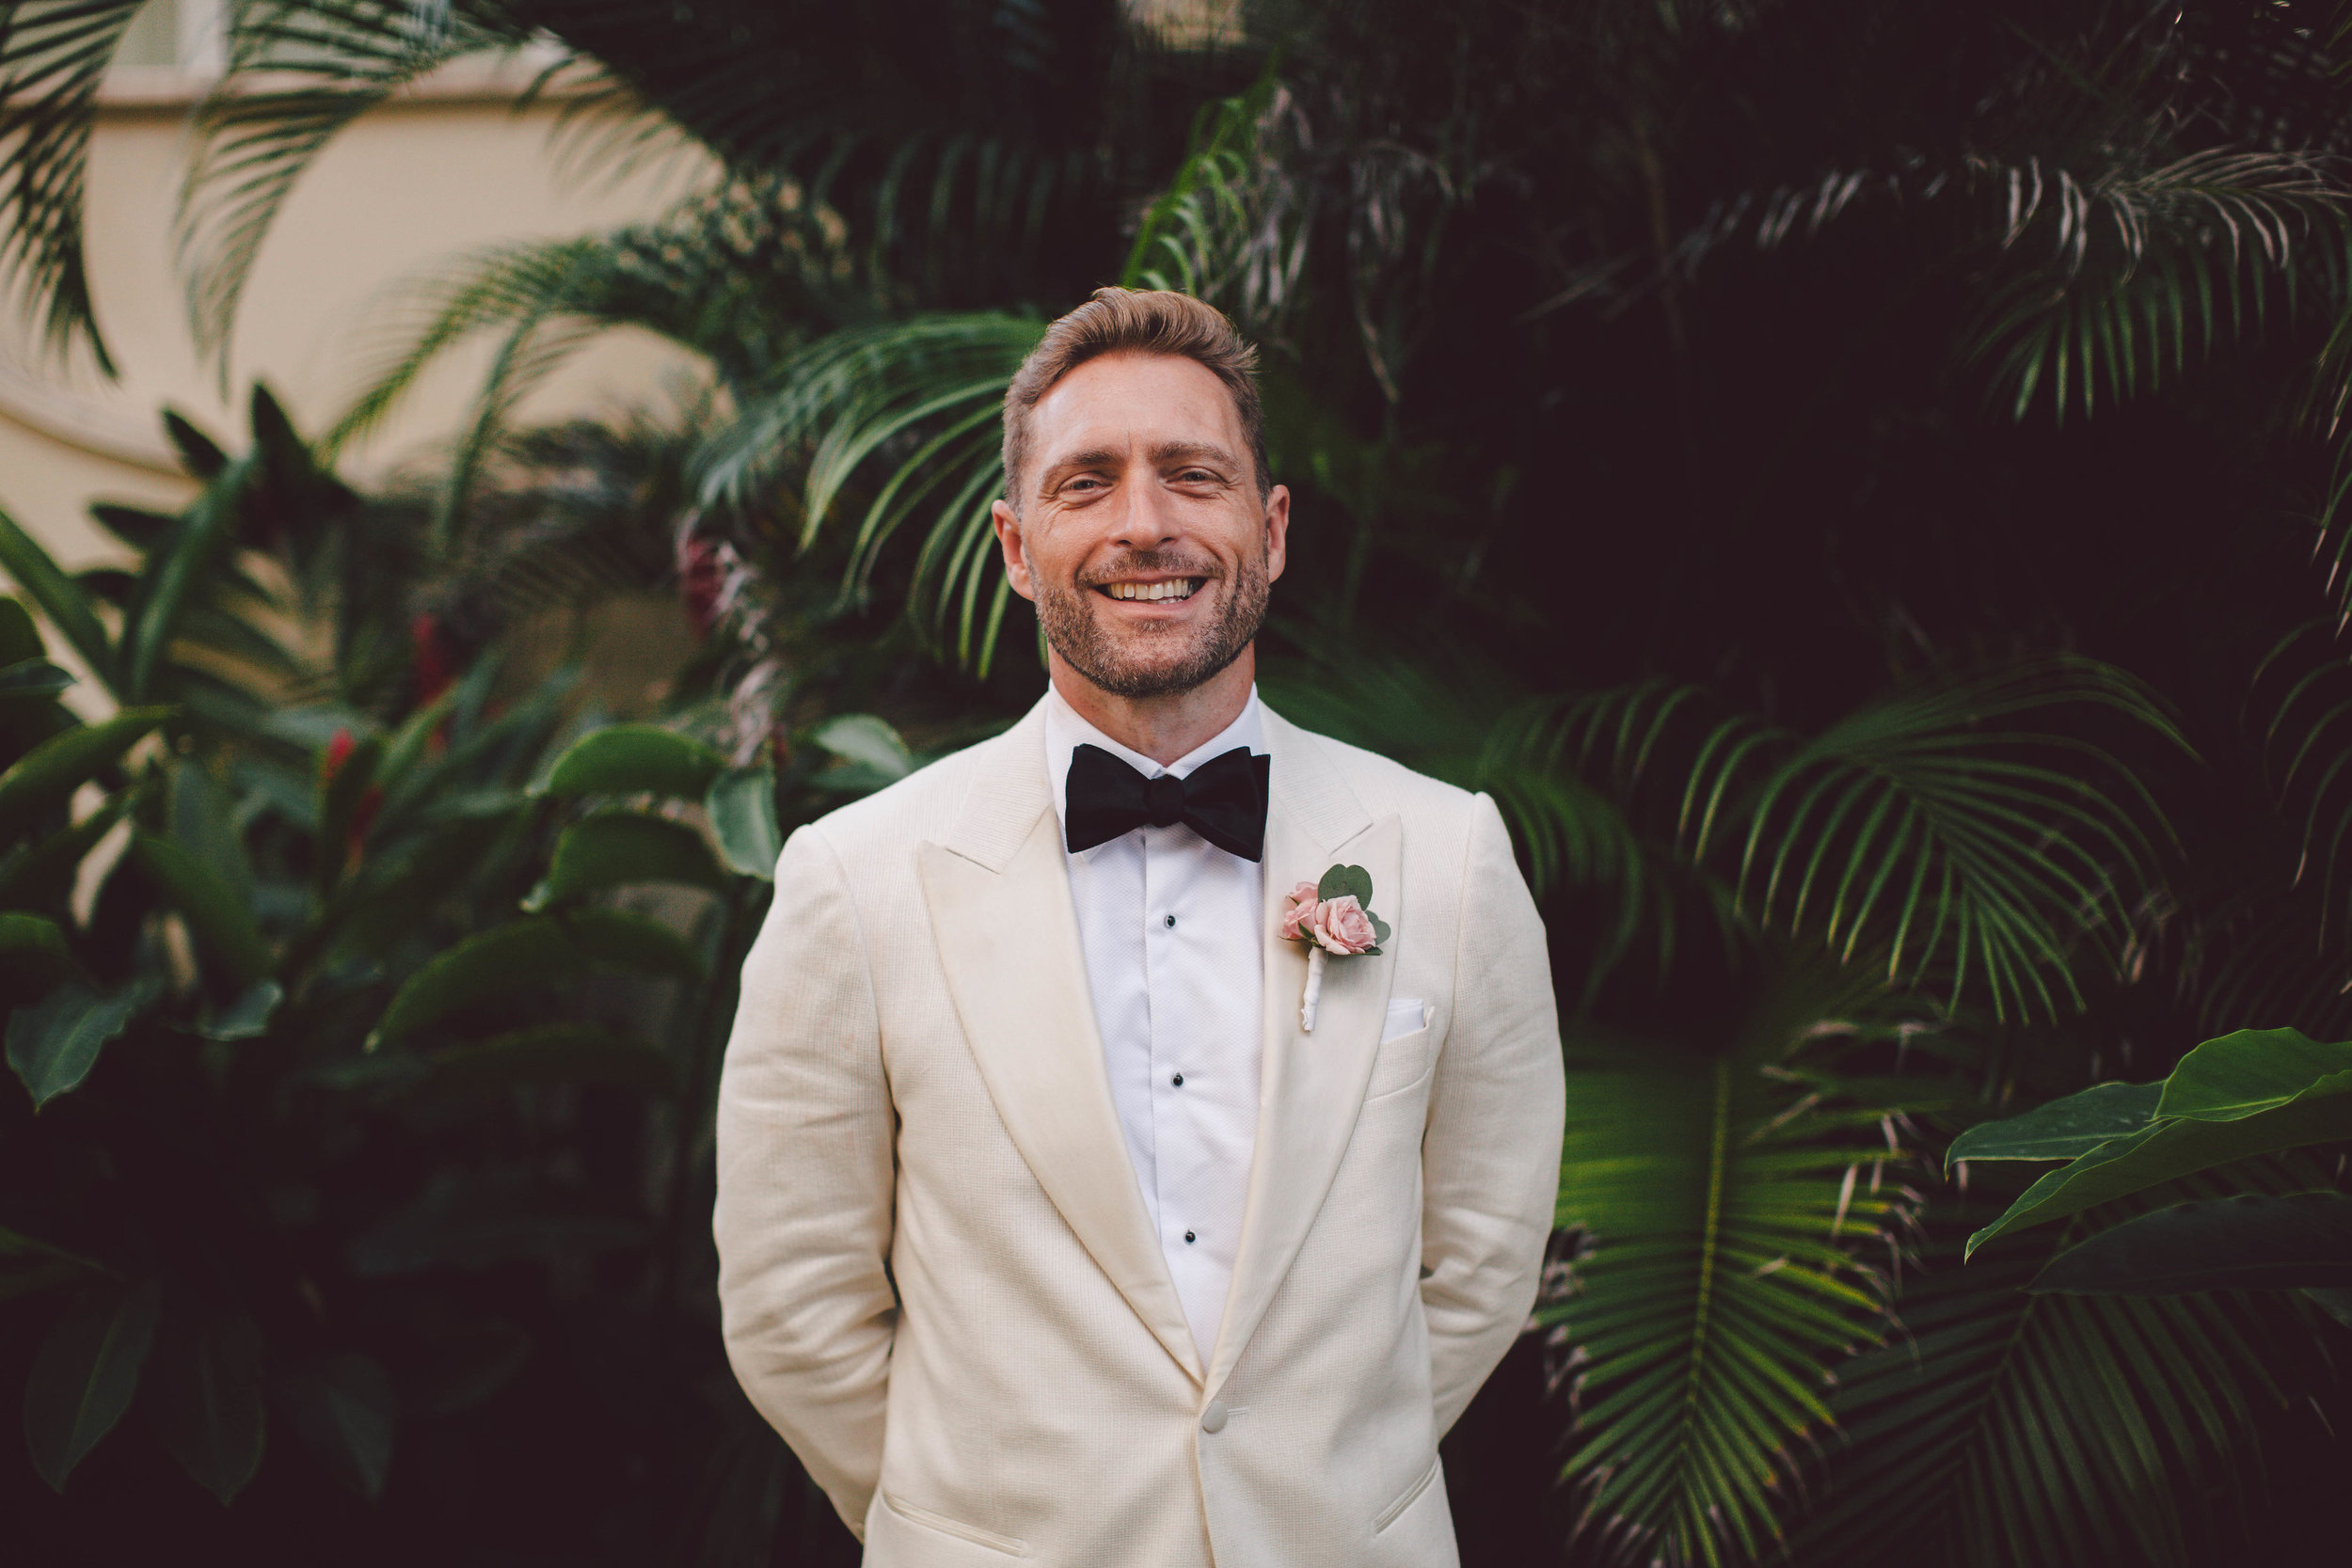 mexico_wedding_cancun_villa_la_joya_evangeline_lane_107.jpg